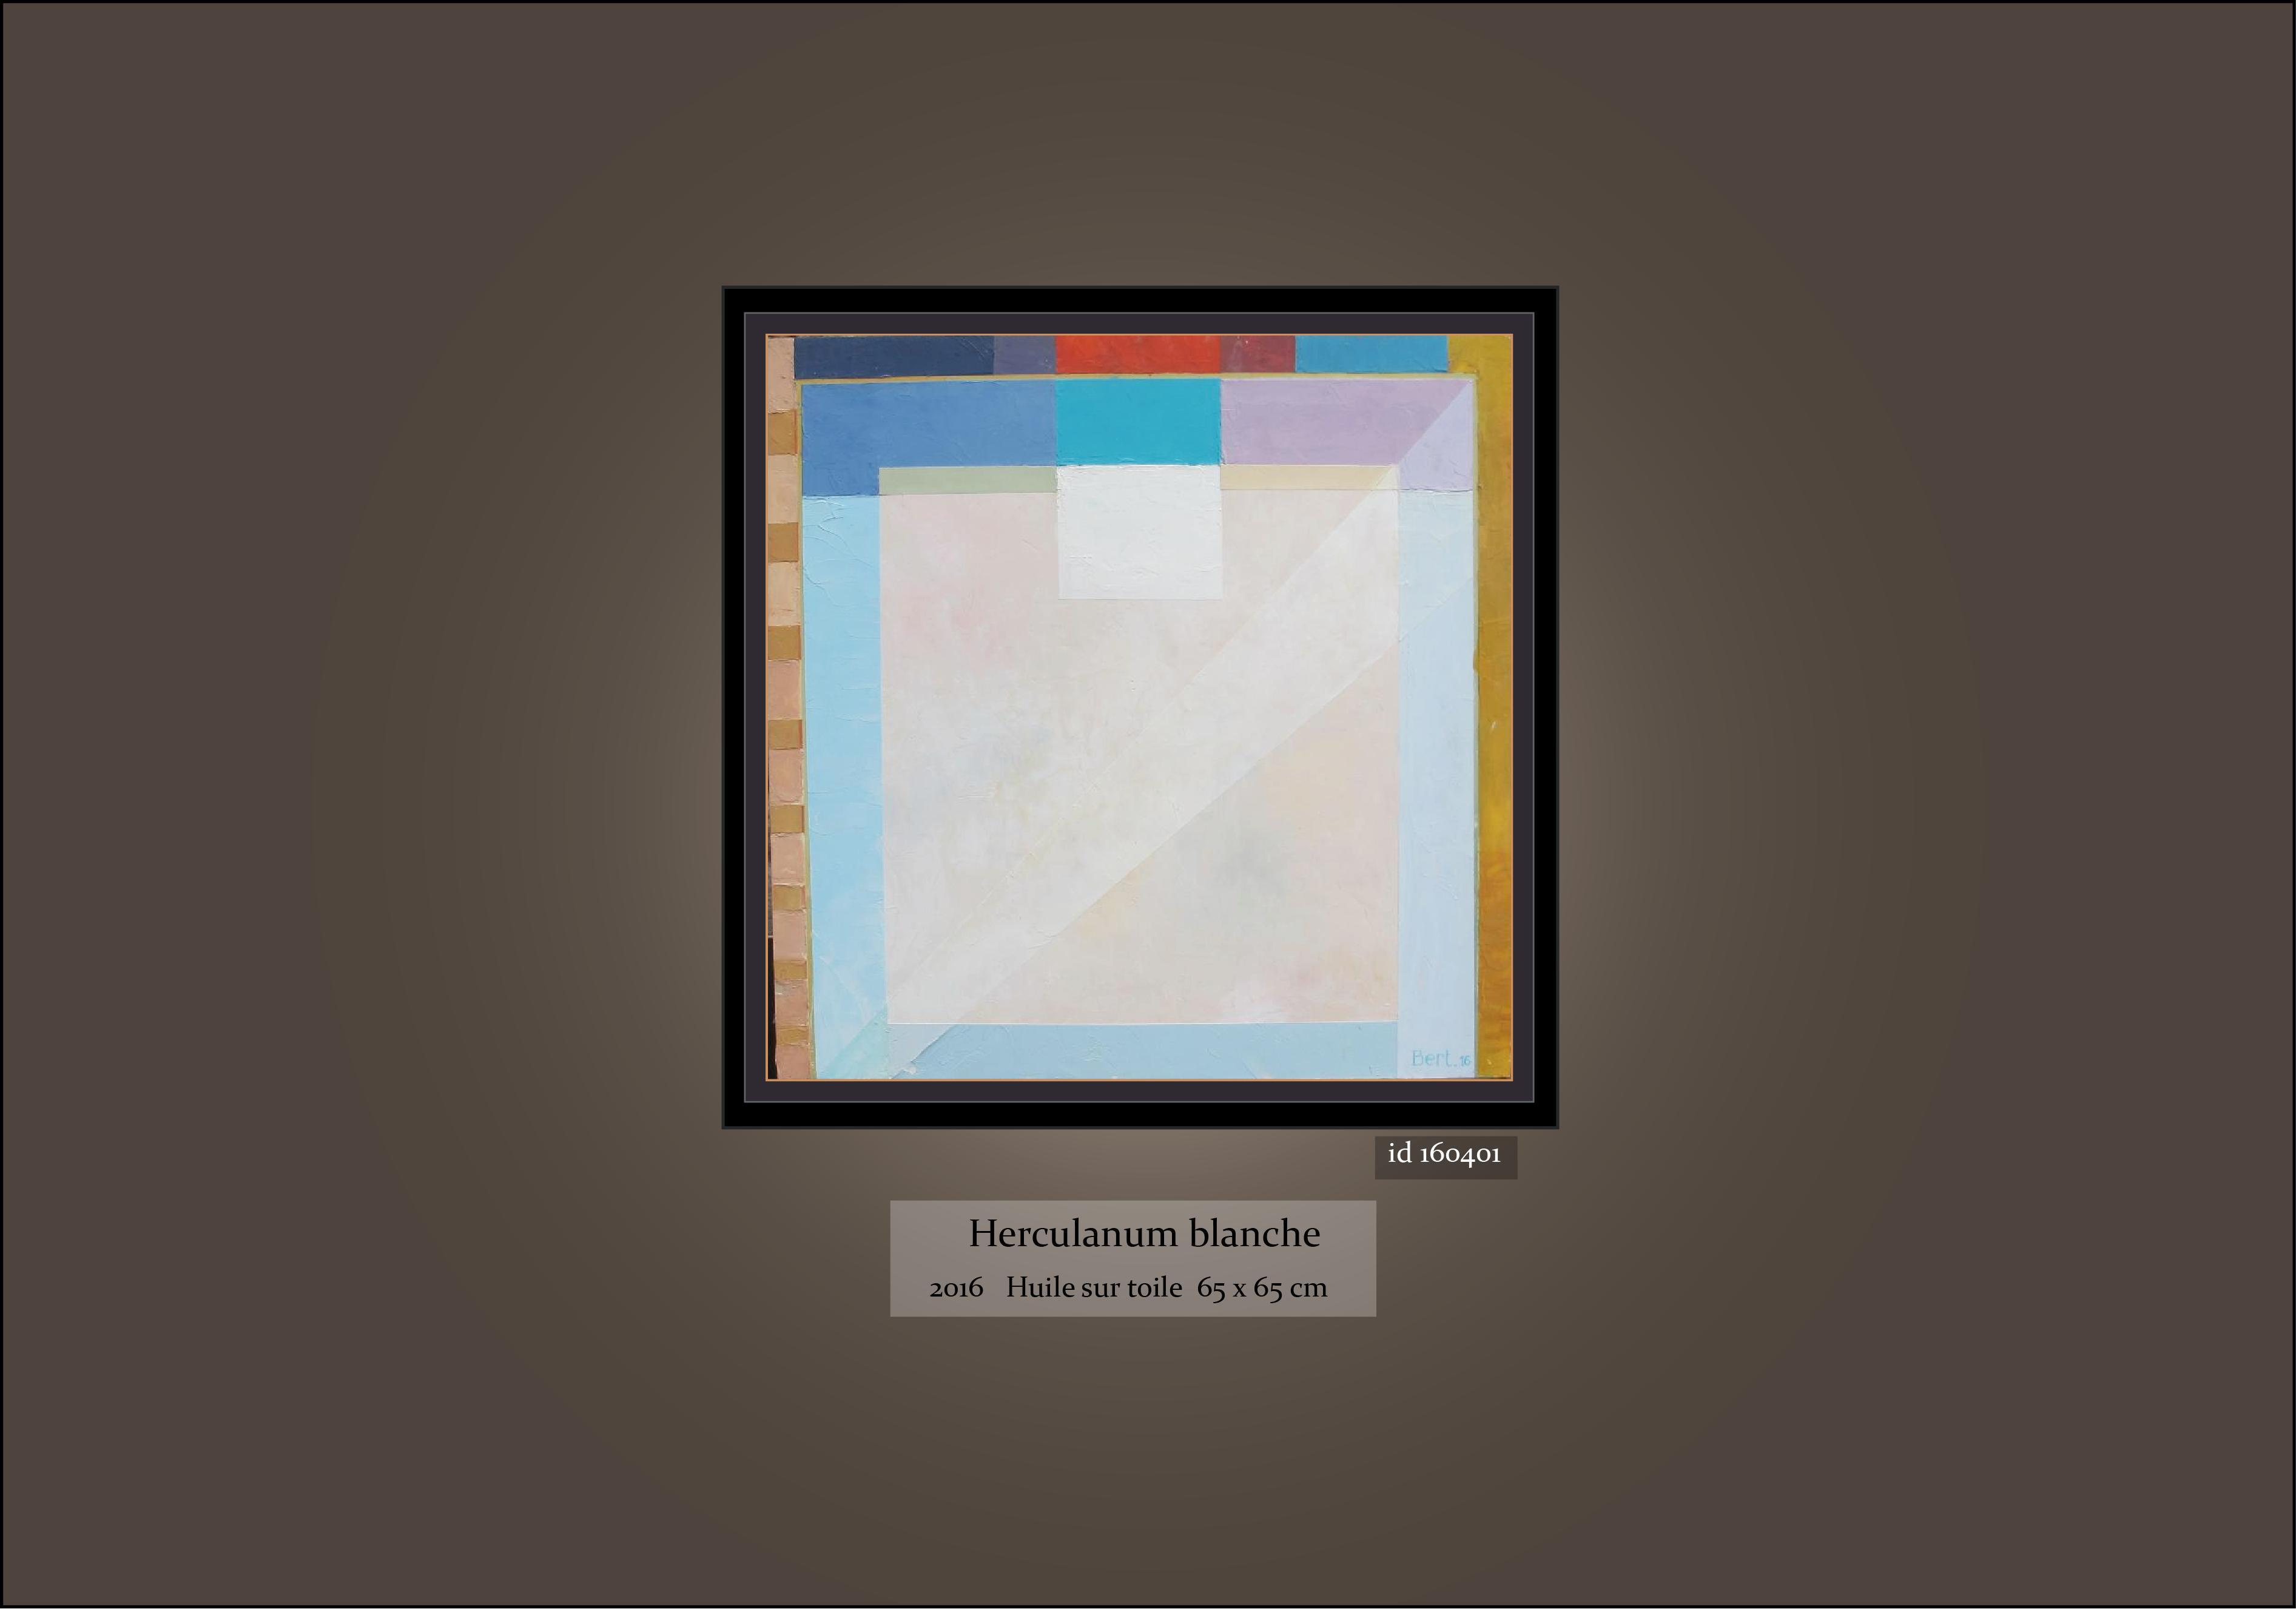 160401 HERCULANUM BLANCHE